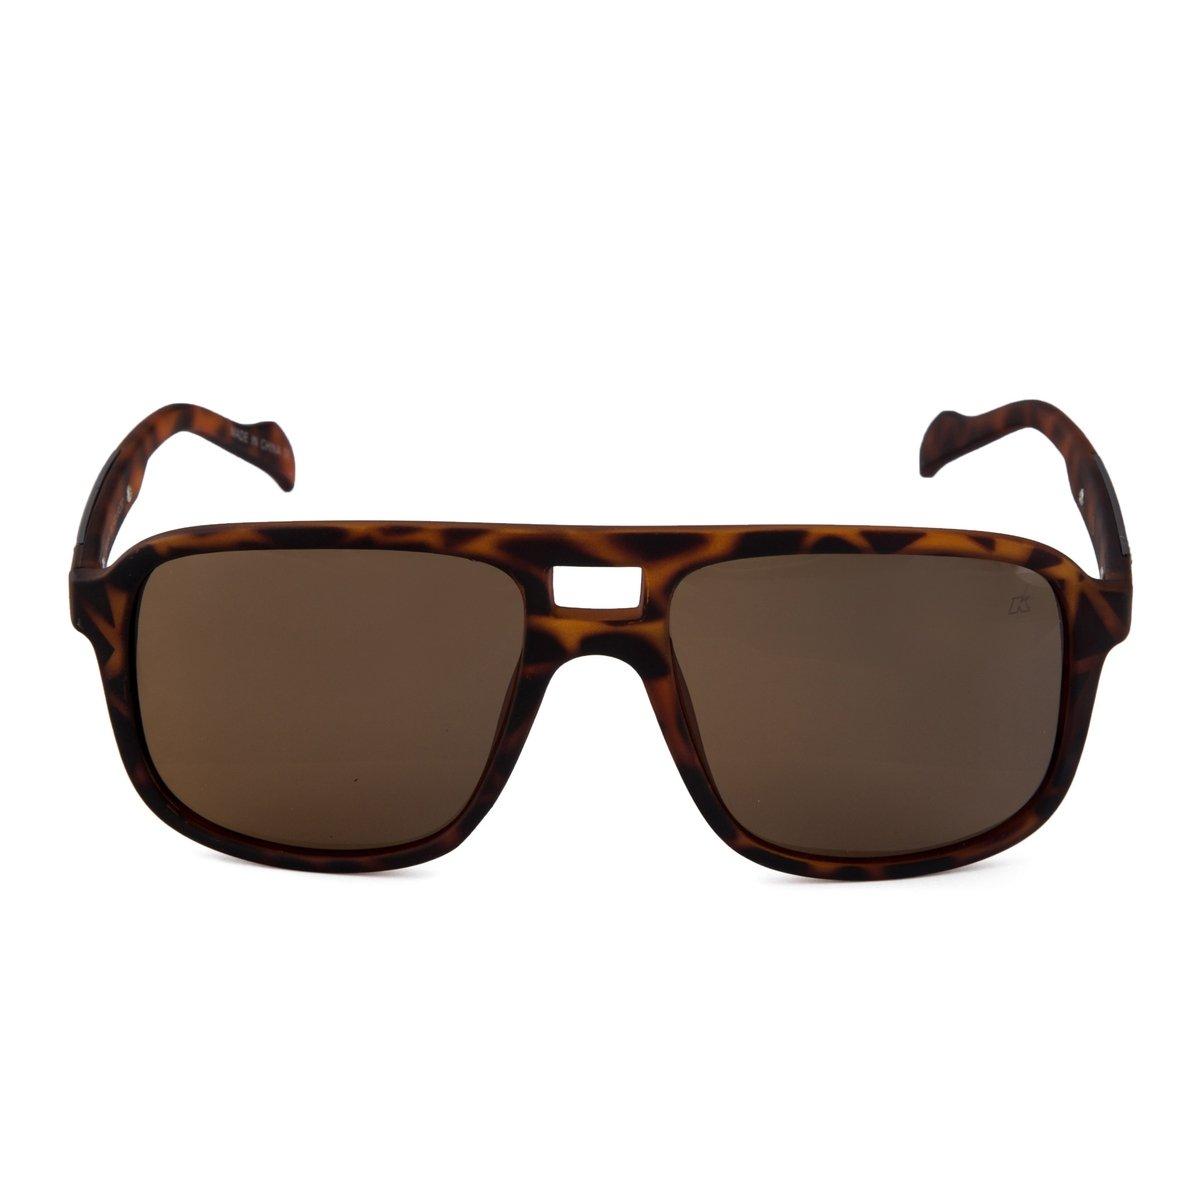 d3b30ff346314 Óculos de Sol Khatto 540954 - Compre Agora